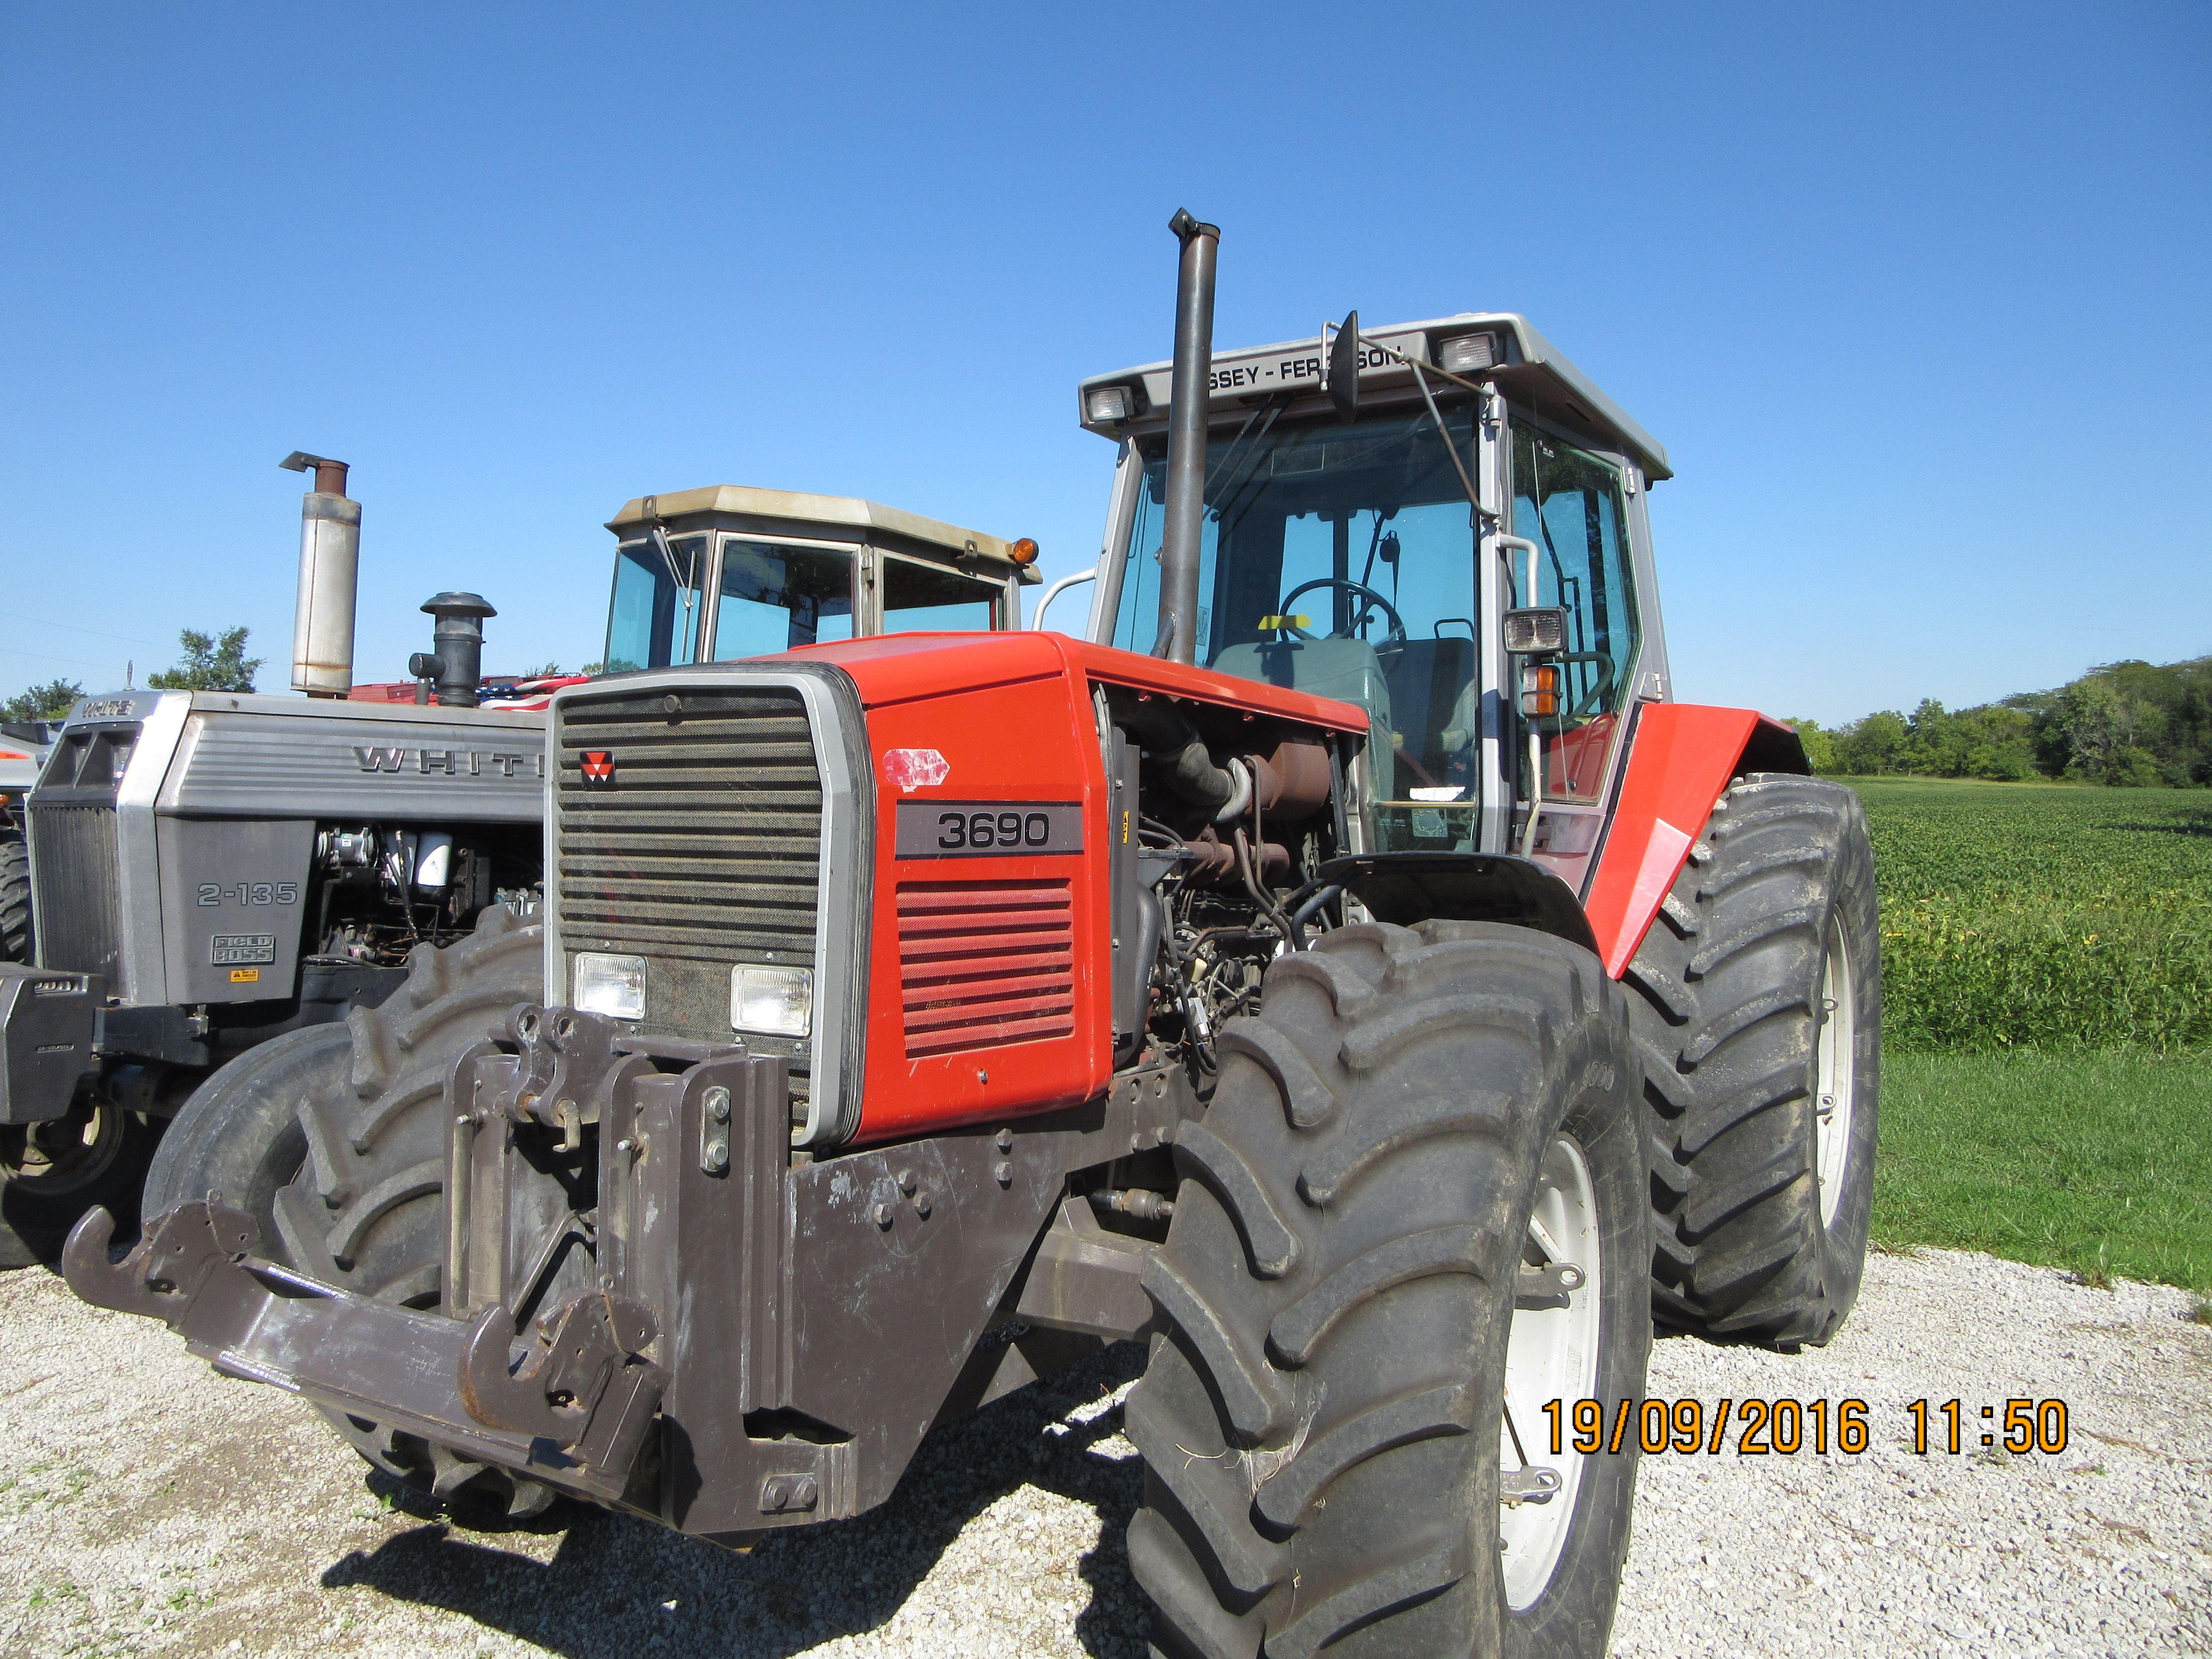 990 Tractor Starter Wiring Moreover Massey Ferguson 135 Wiring Diagram